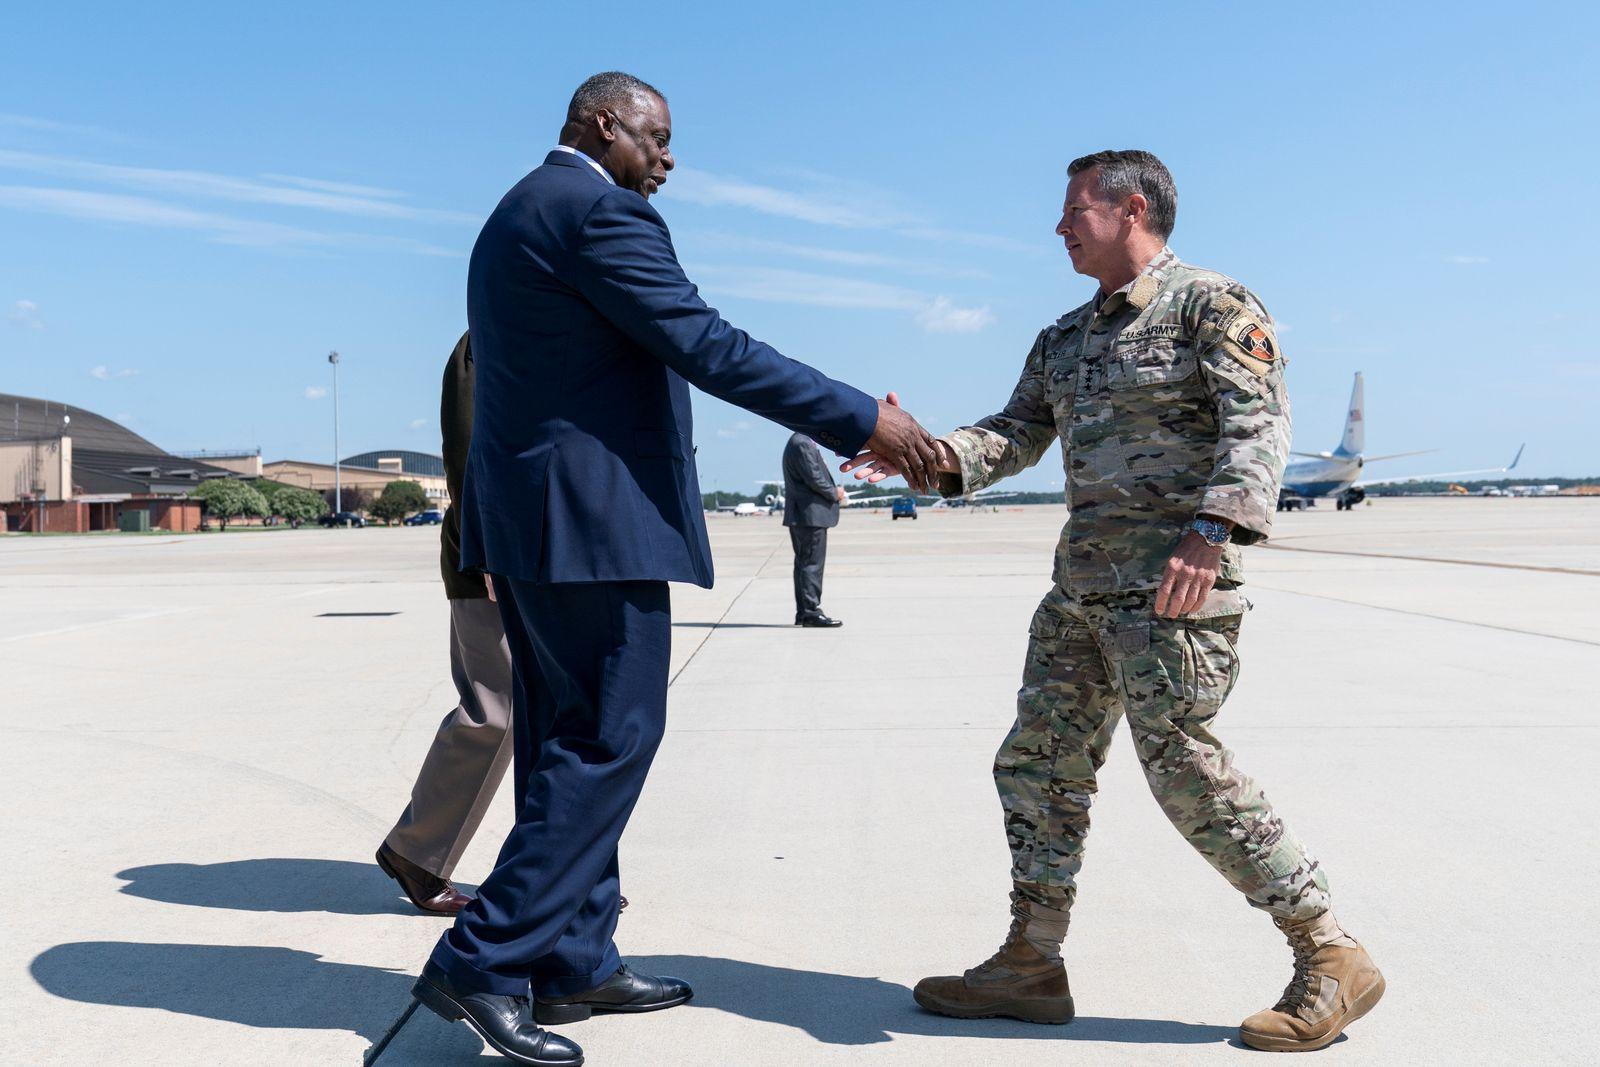 General Miller's return from Afghanistan